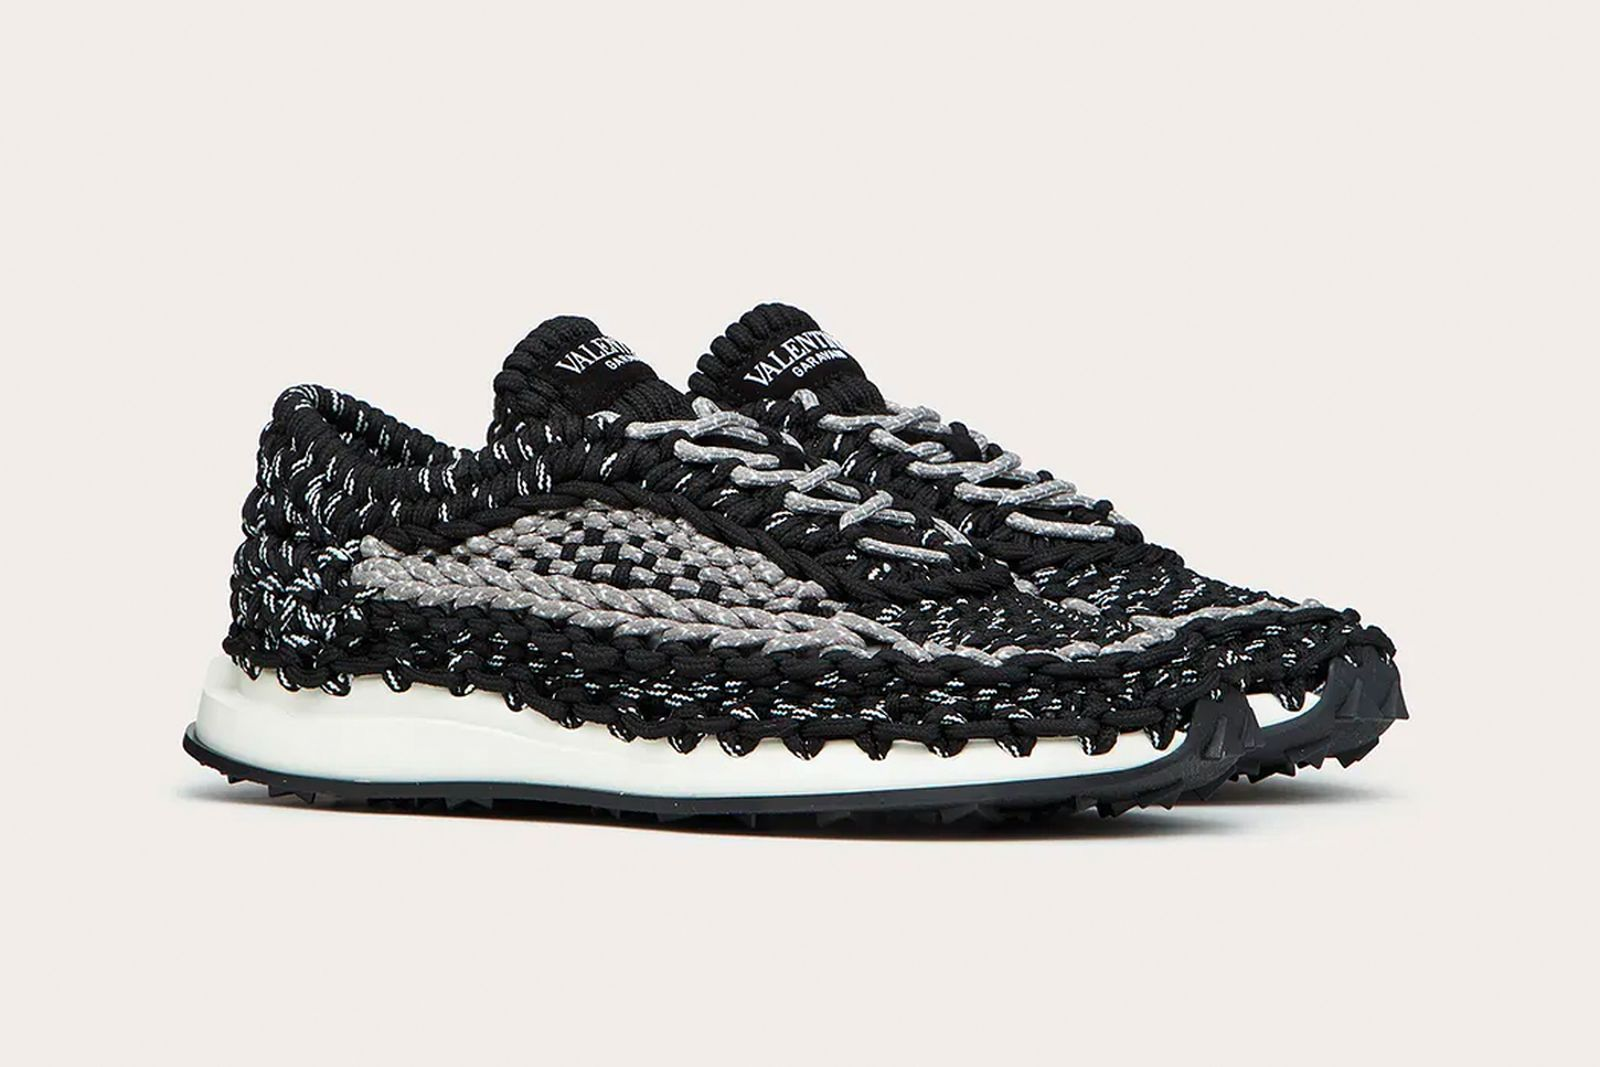 valentino-garavani-crochet-sneakers-release-date-price-02